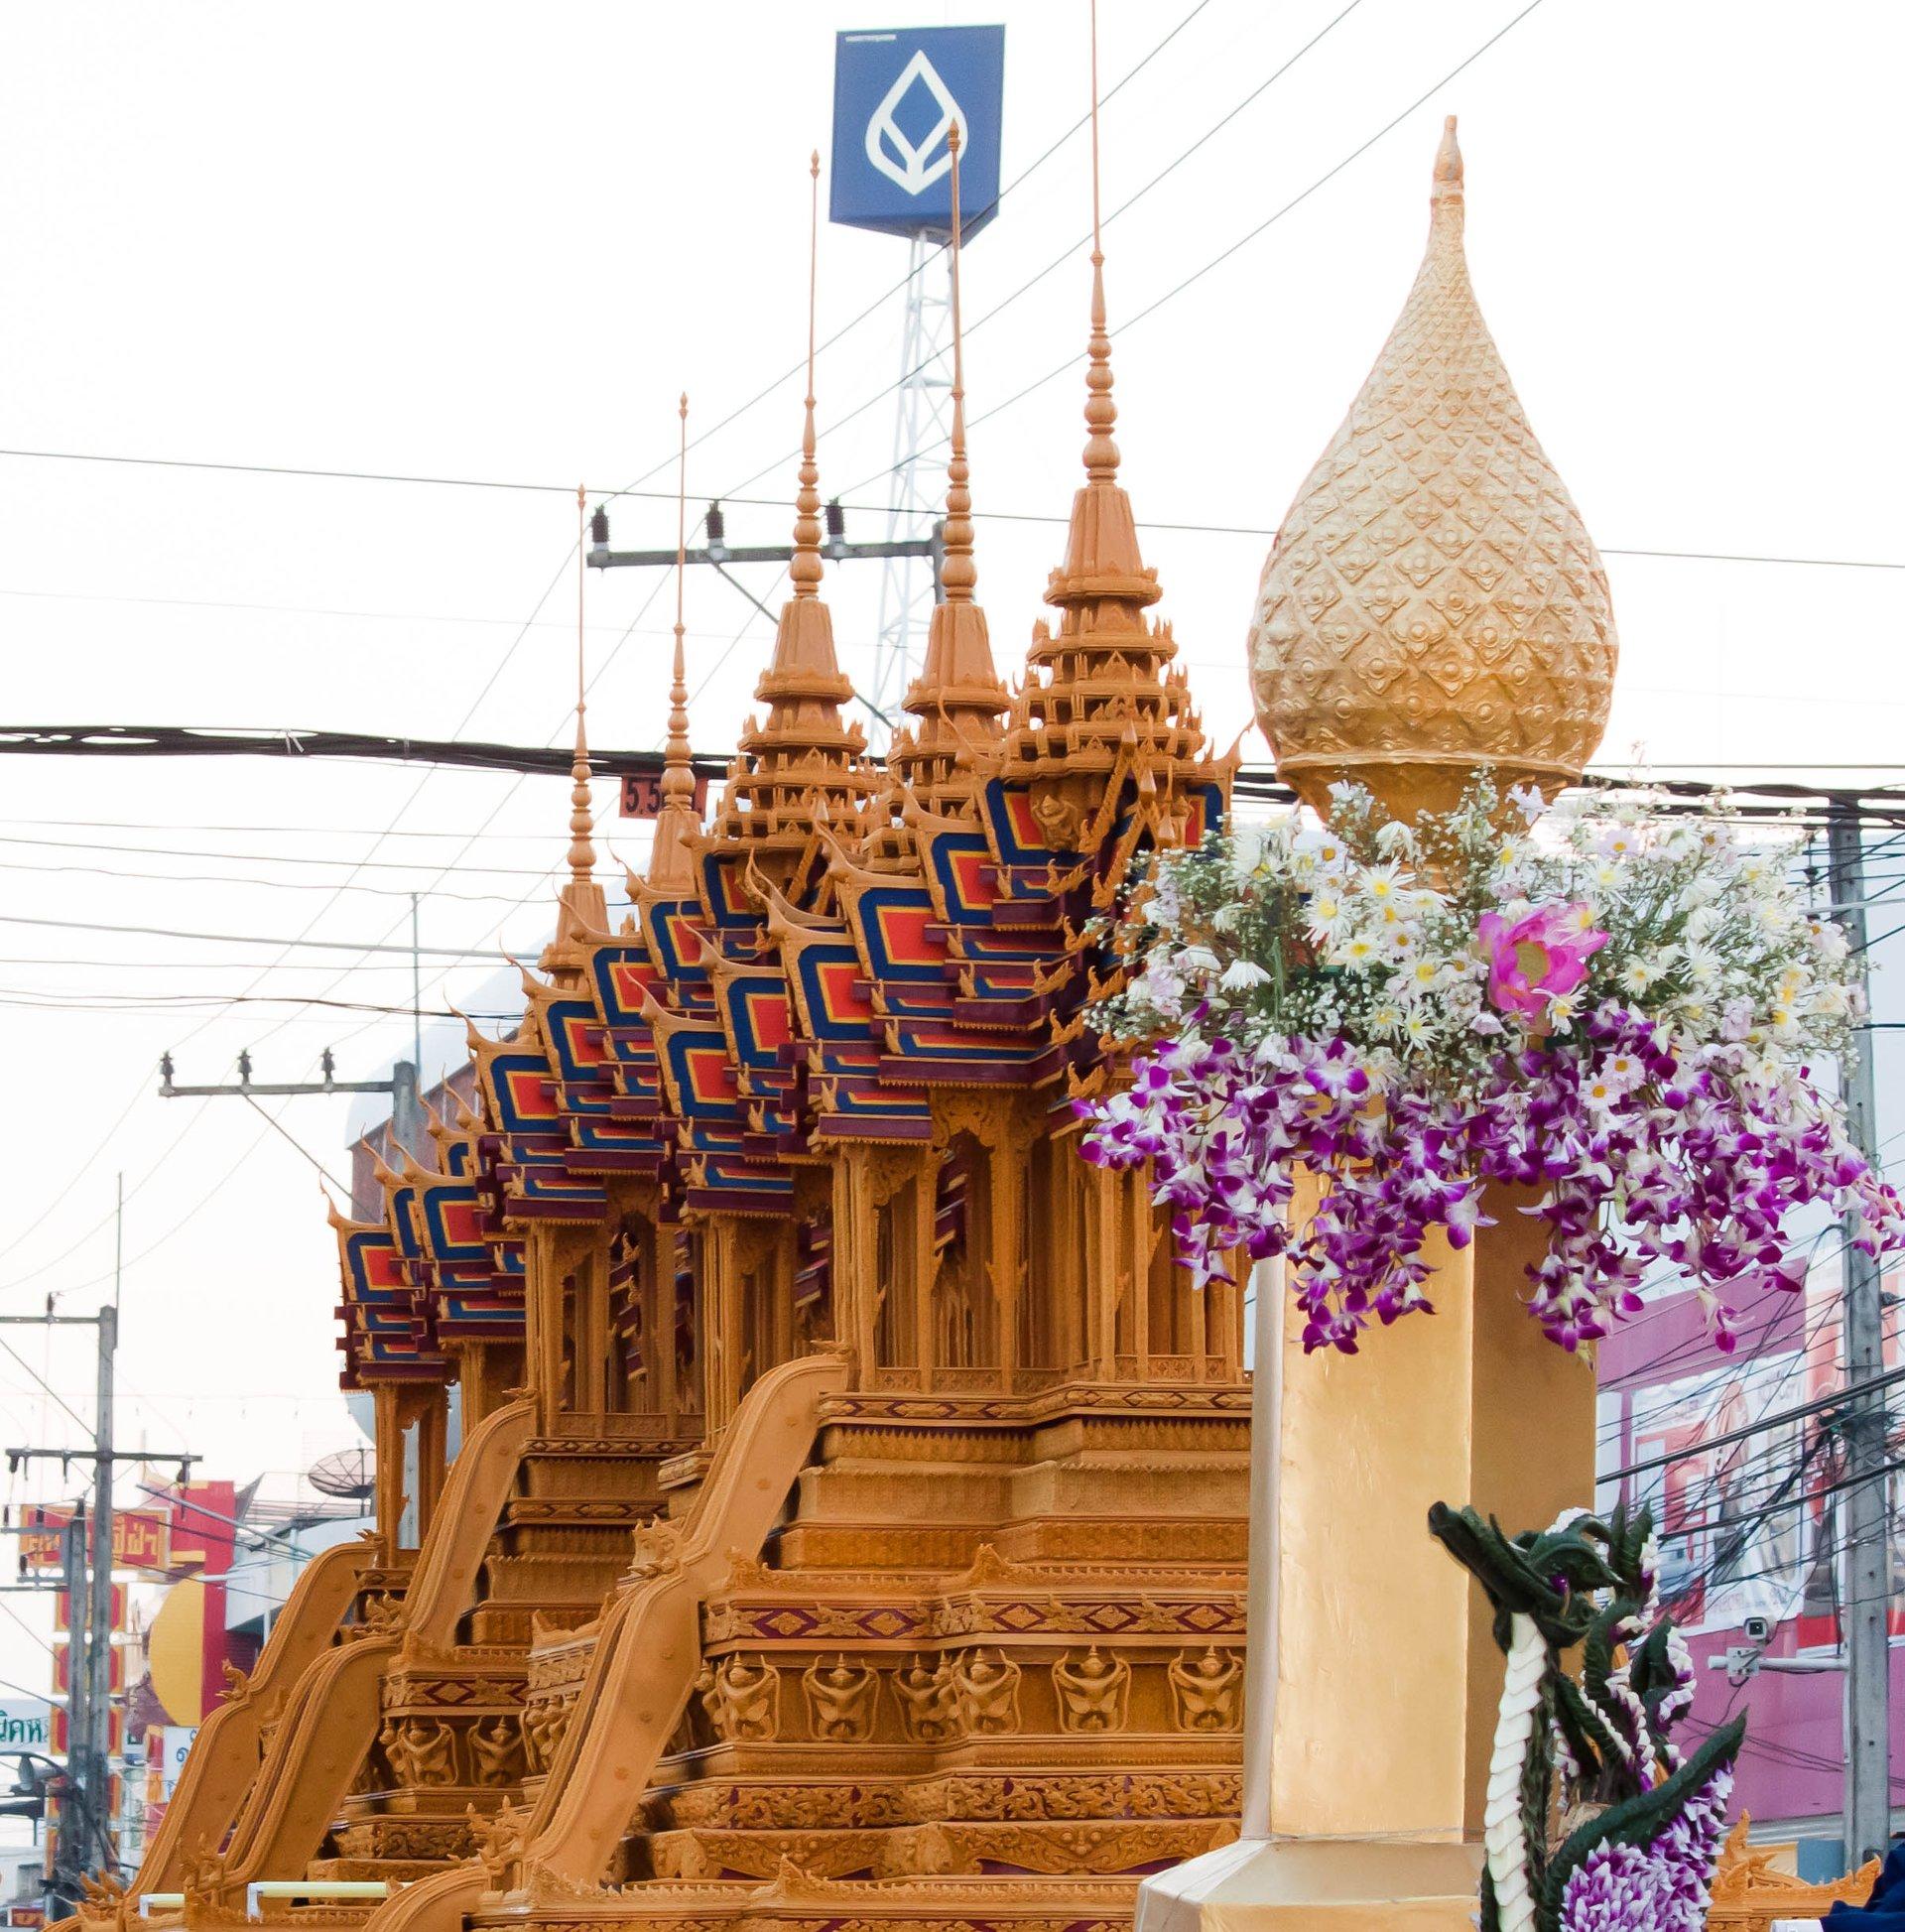 Sakon Nakhon Wax Castle Festival in Thailand 2020 - Best Time